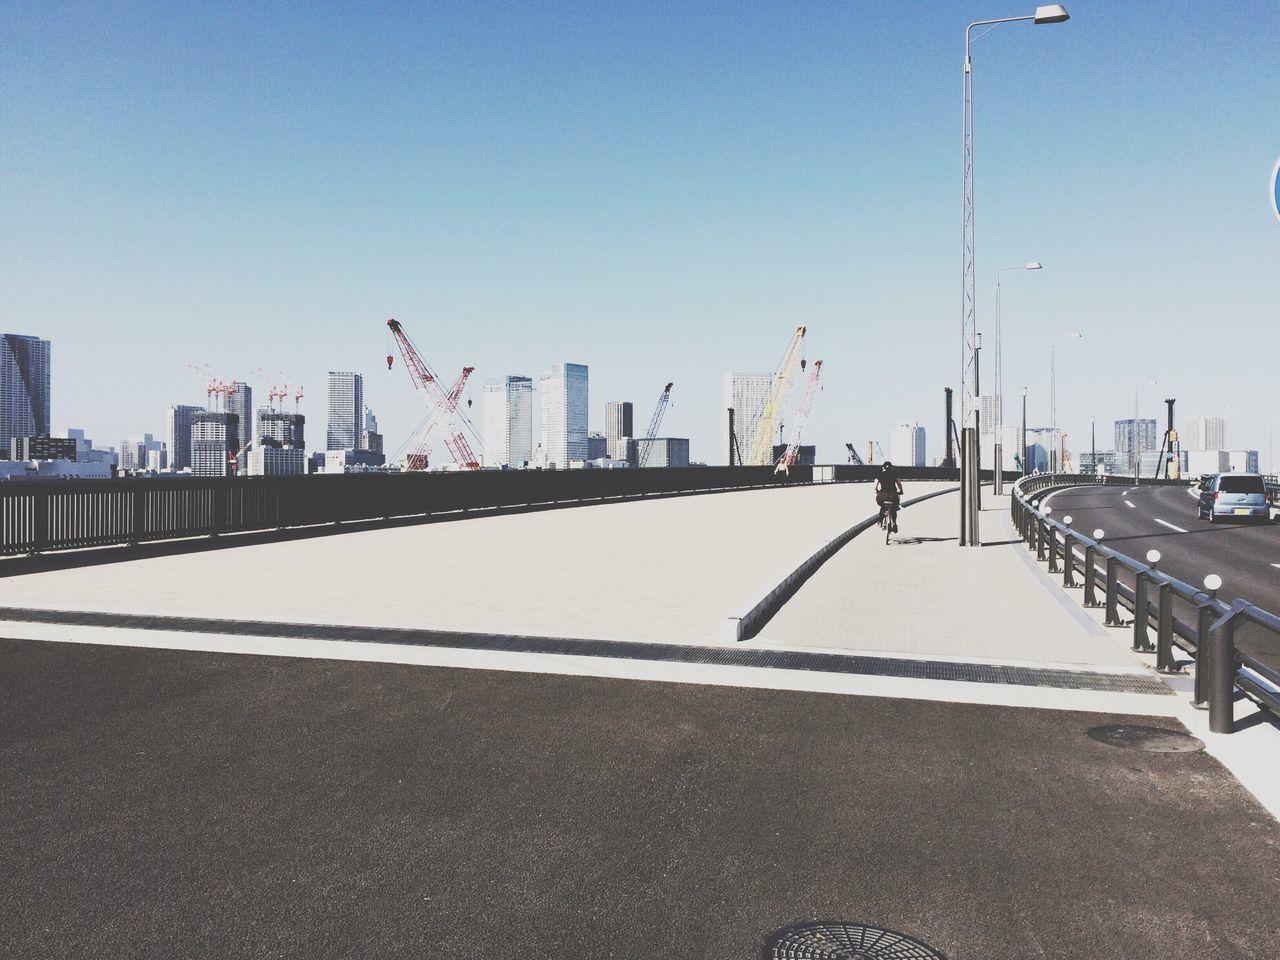 Clear Sky Built Structure Street Photography Bridge